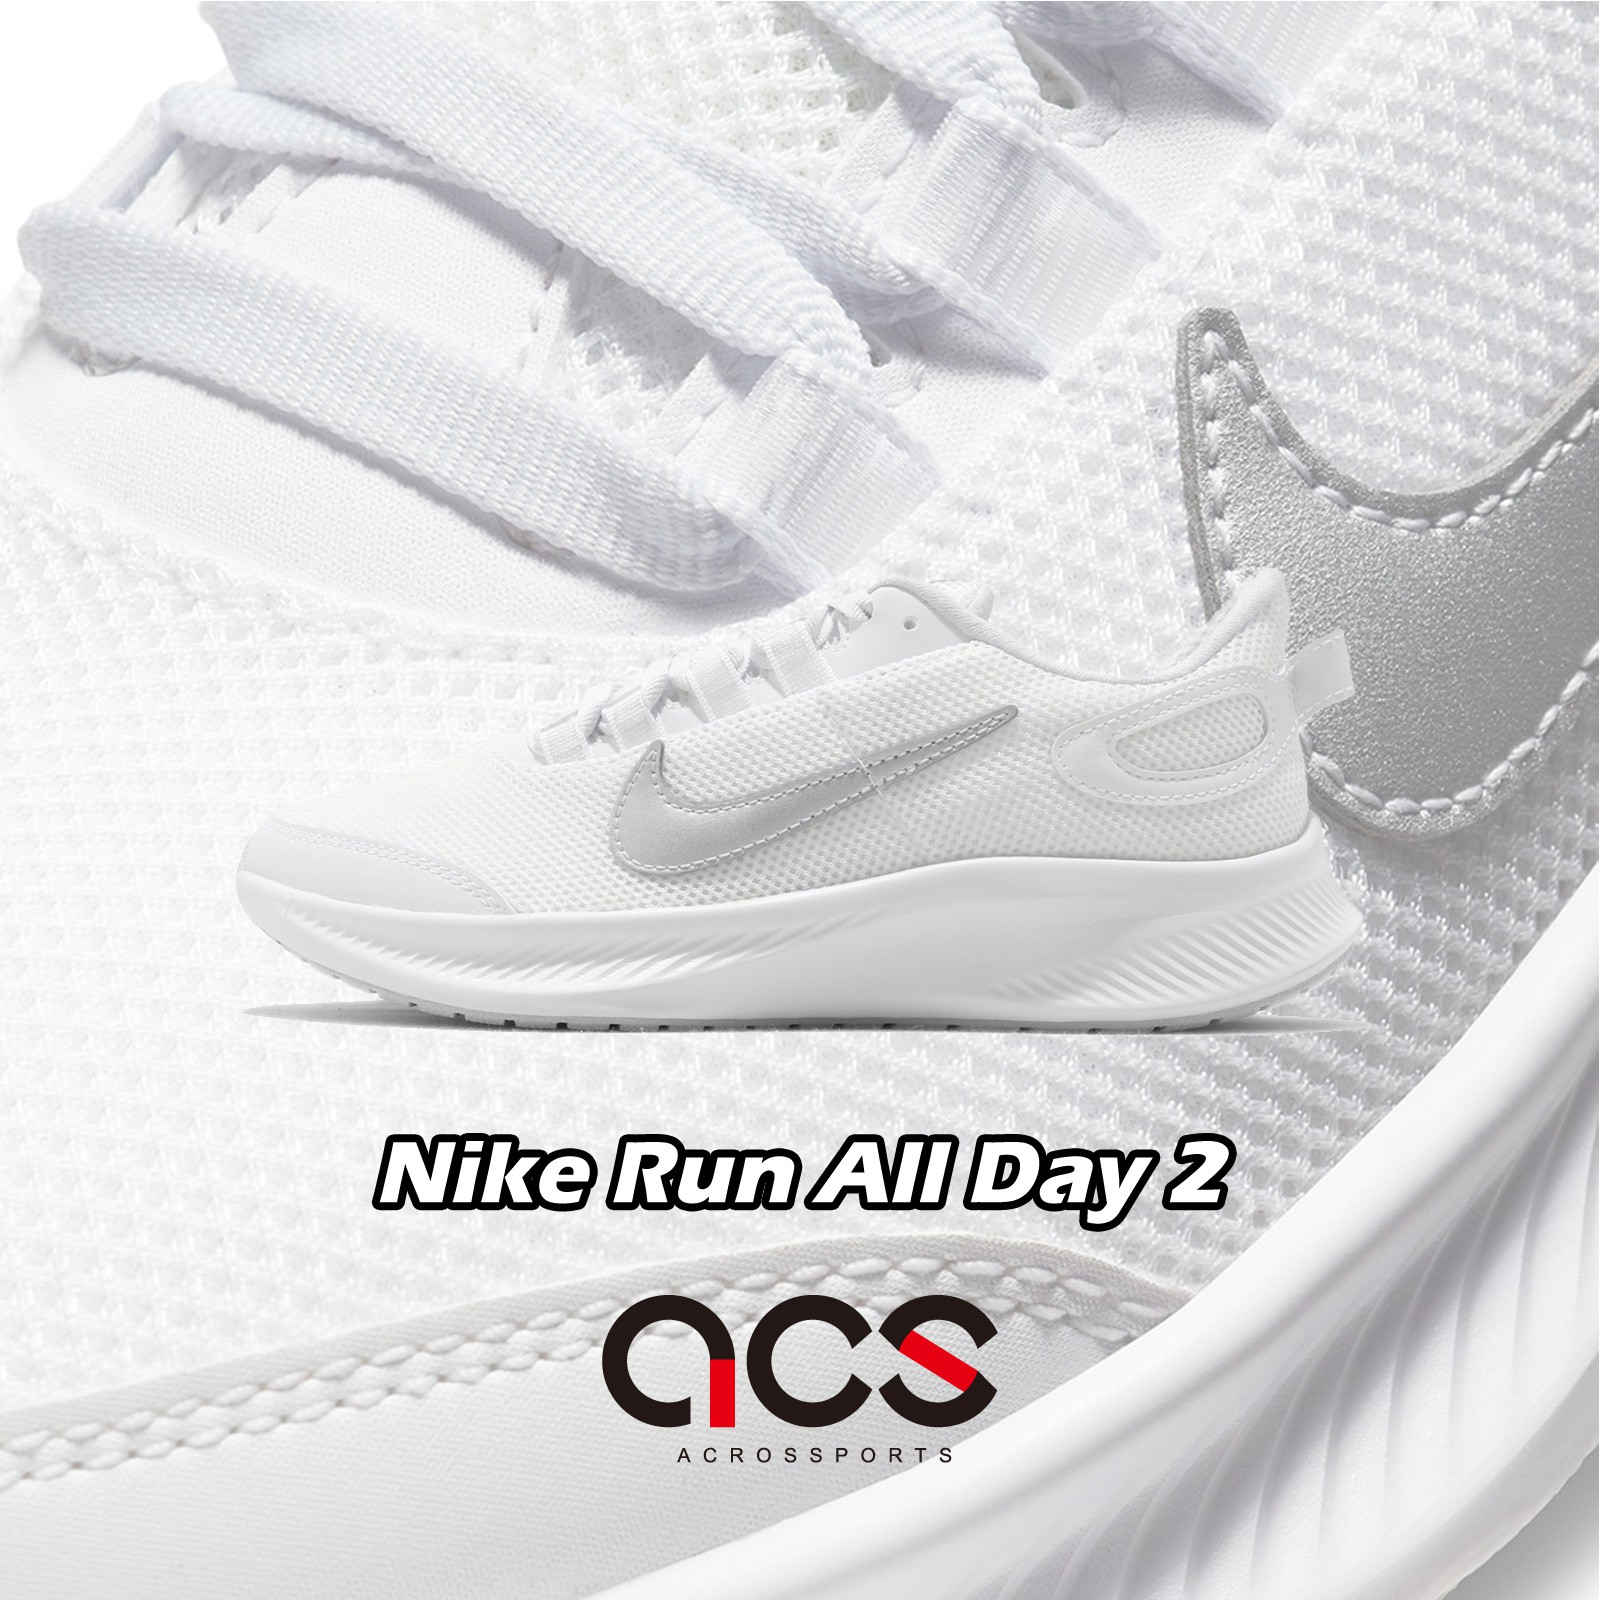 Nike 慢跑鞋 Wmns Runallday 2 白 灰 小白鞋 運動鞋 女鞋 【ACS】 CD0224-100